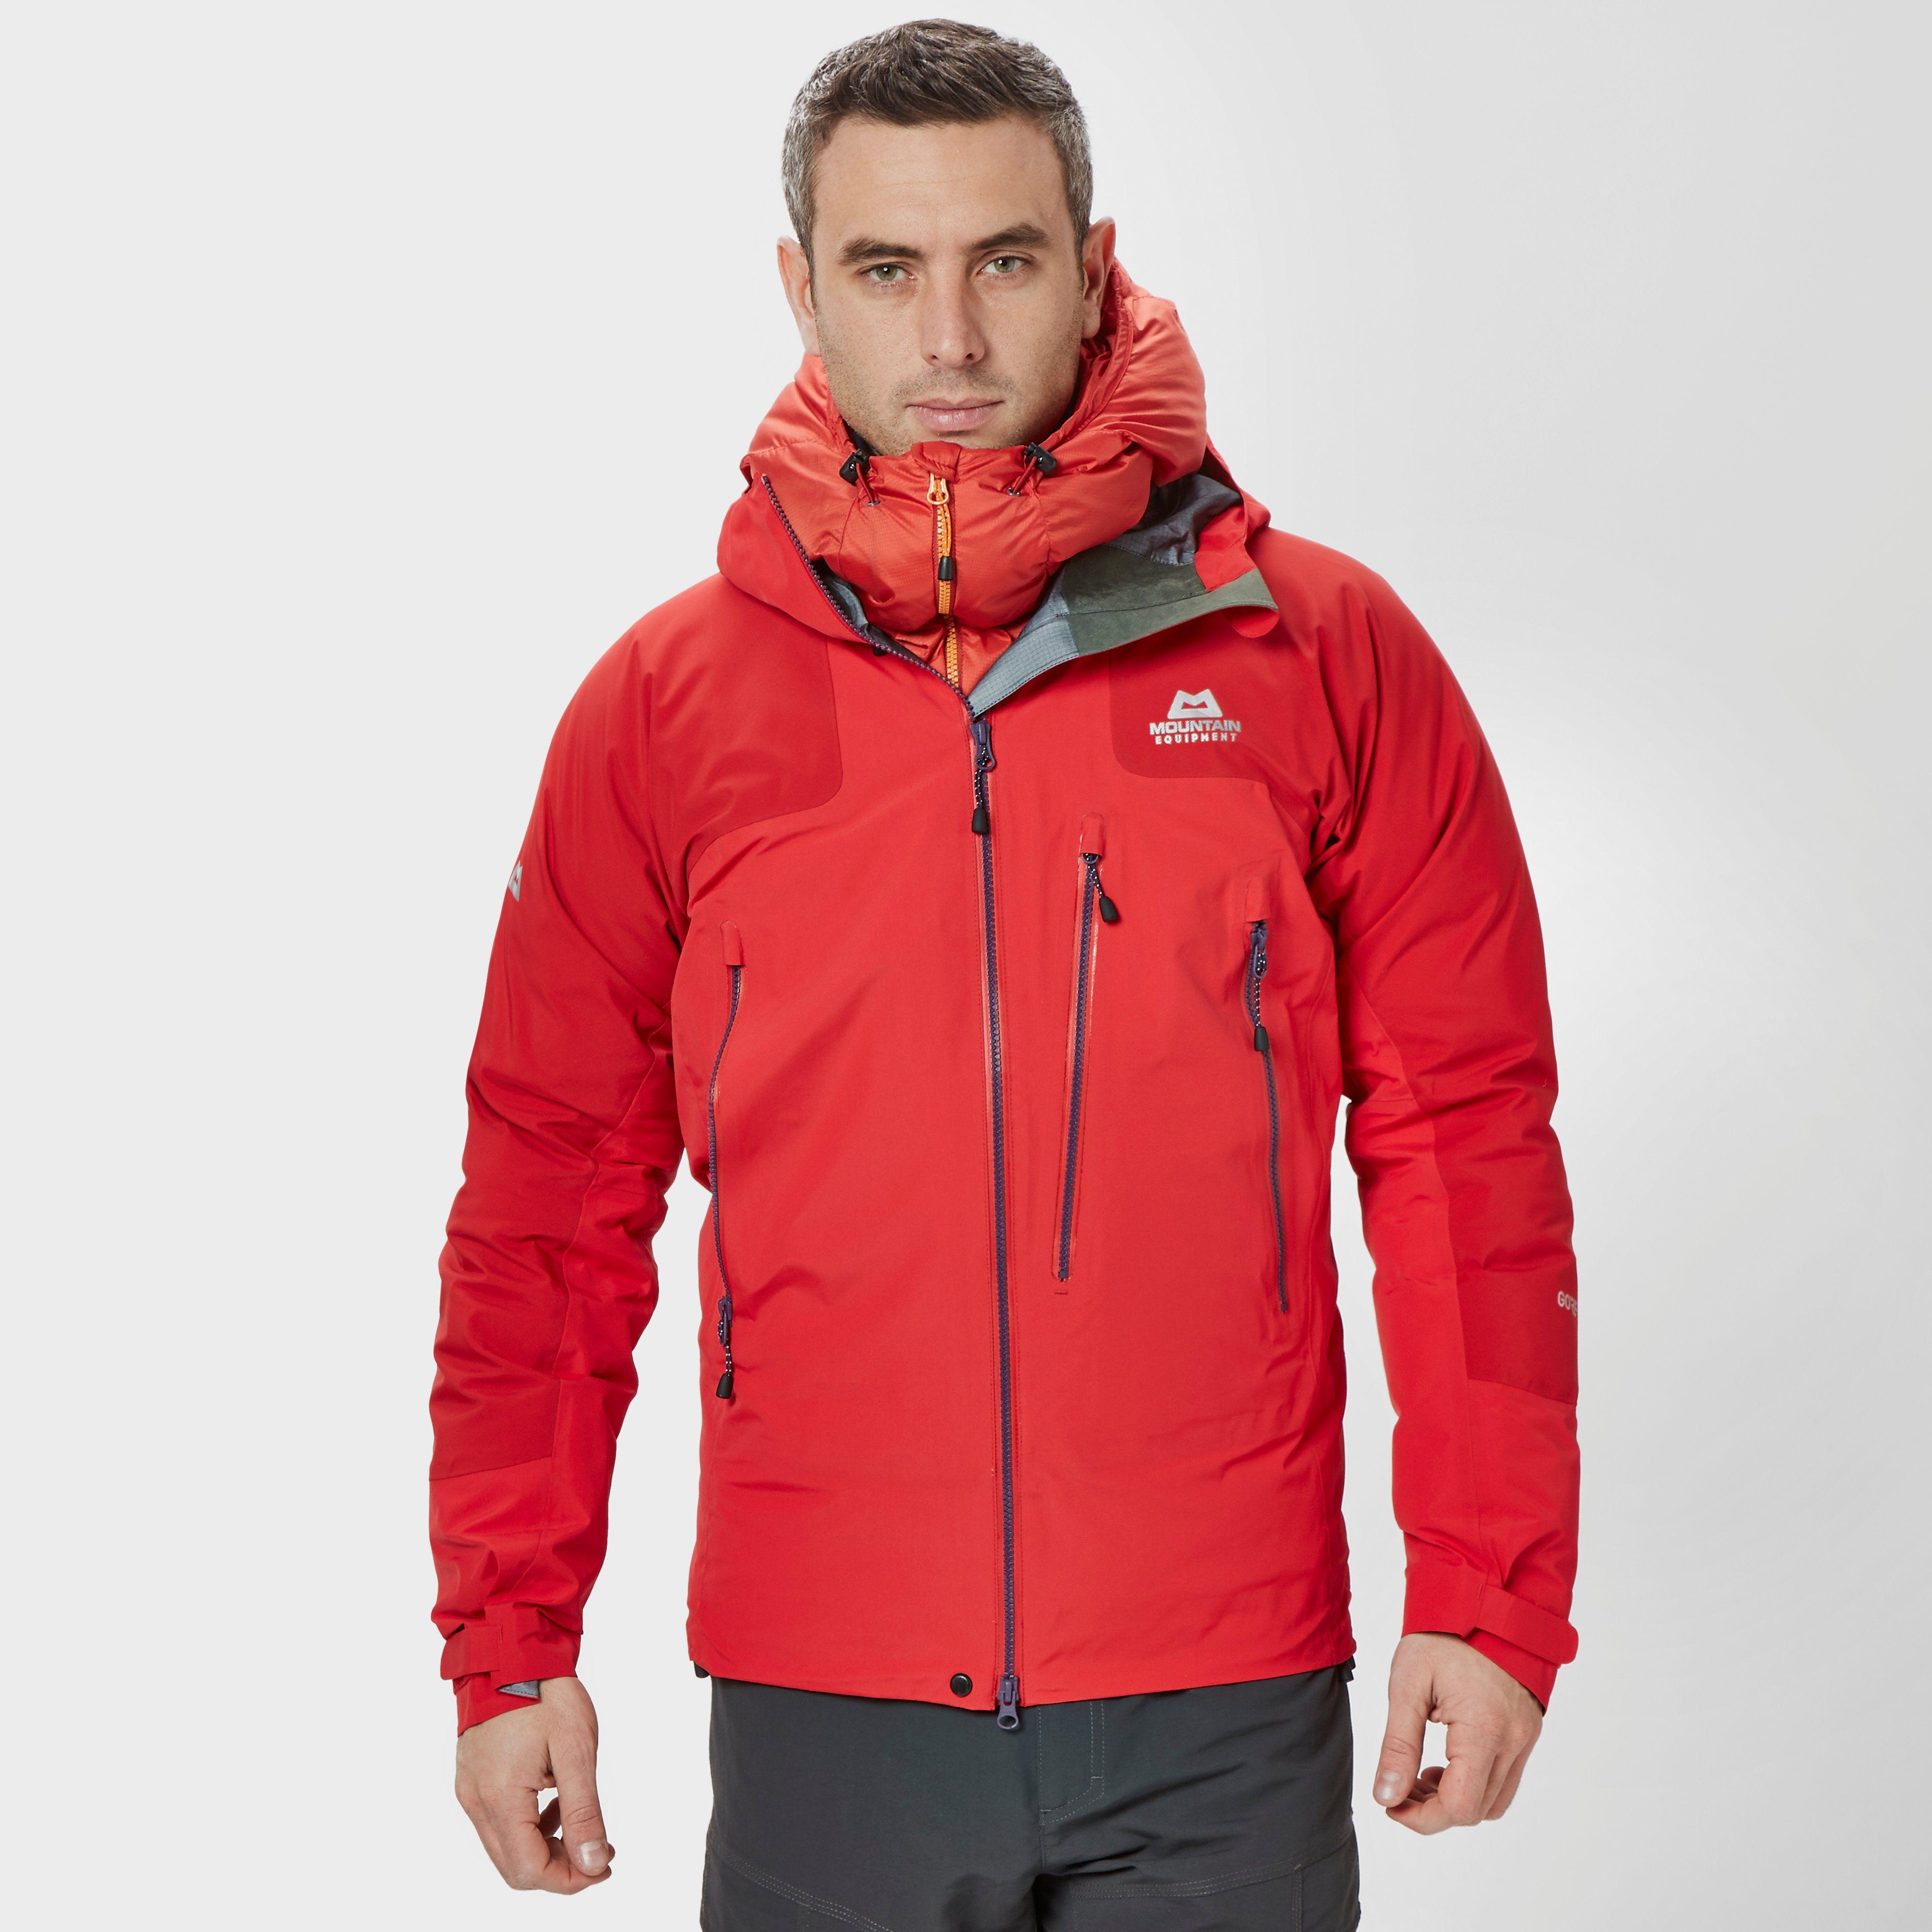 MOUNTAIN EQUIPMENT Men's Lhotse GORE-TEX® Pro Jacket